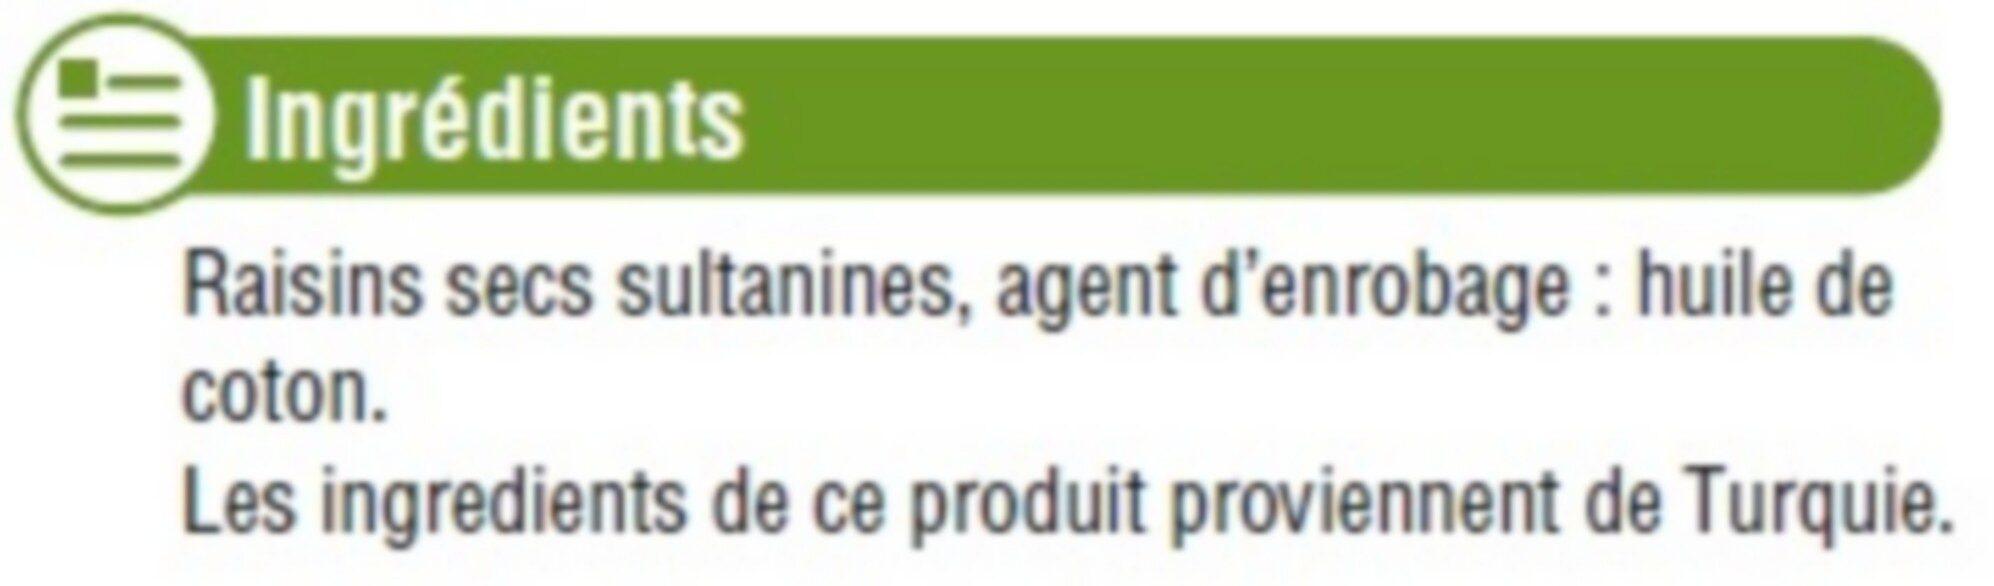 Raisin sec Sultanine, calibre 235/265 - Ingrédients - fr